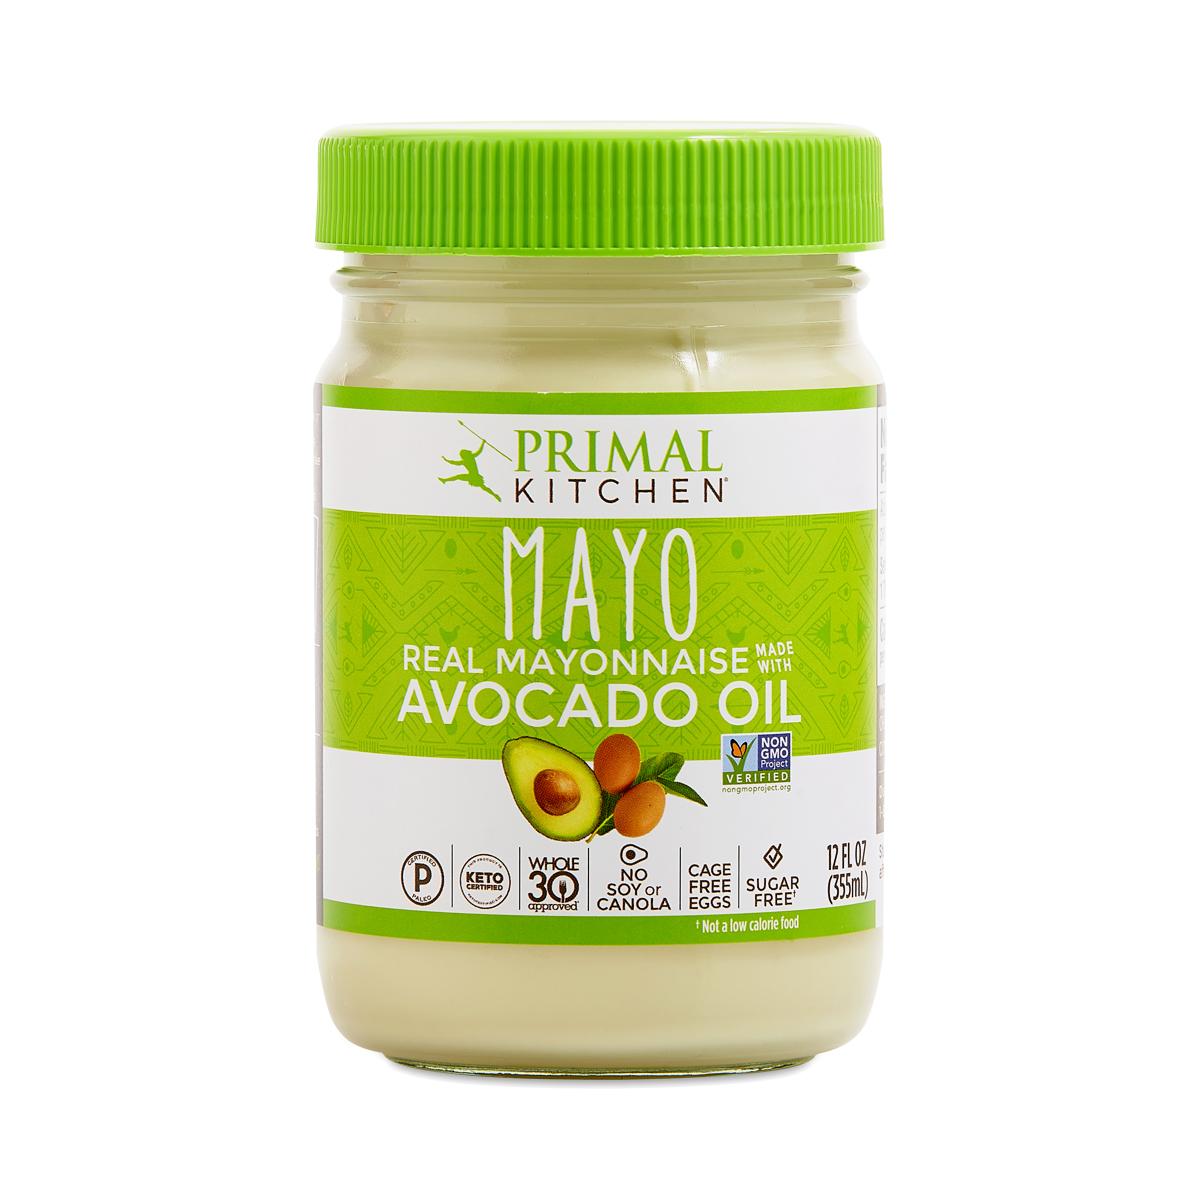 Primal Kitchen Avocado Oil Mayo 12 fl oz jar